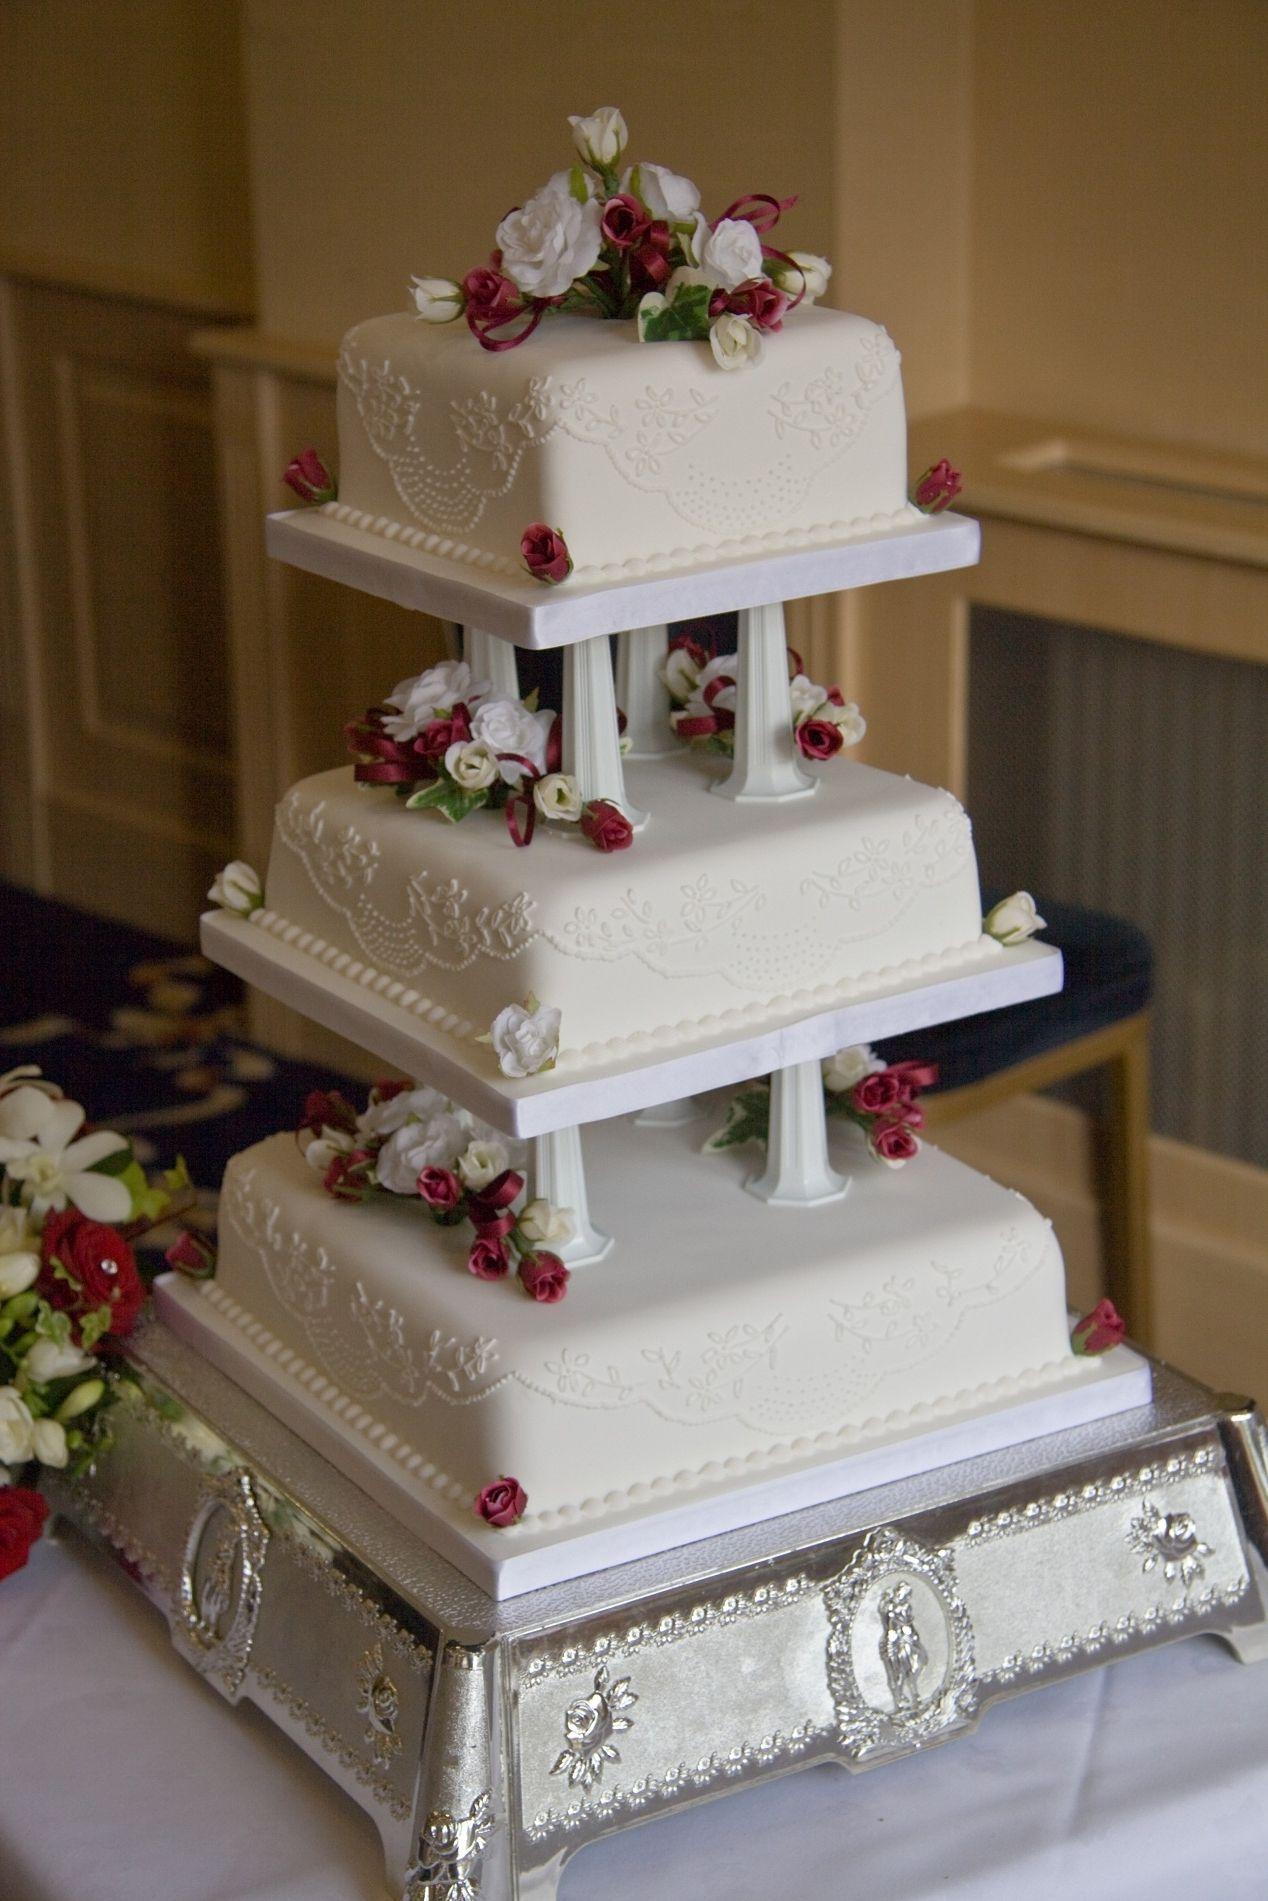 Square Wedding Cakes With Columns  Wedding Dress  Pinterest